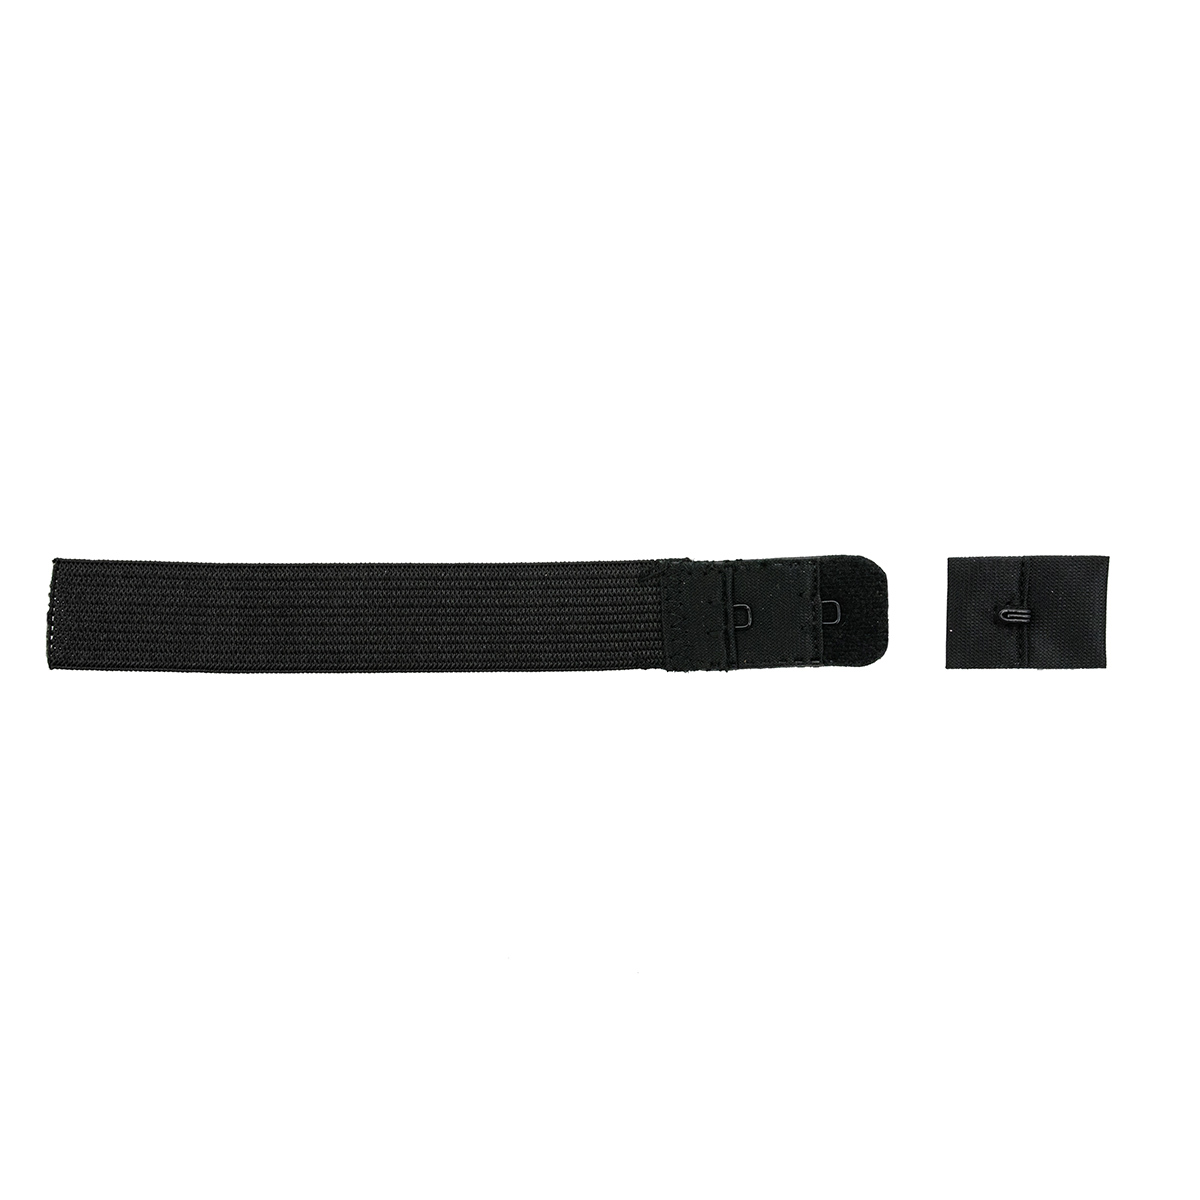 850101 Застежка для бюстгалтера, черный, 19 мм, 1 крючок, Hobby&Pro